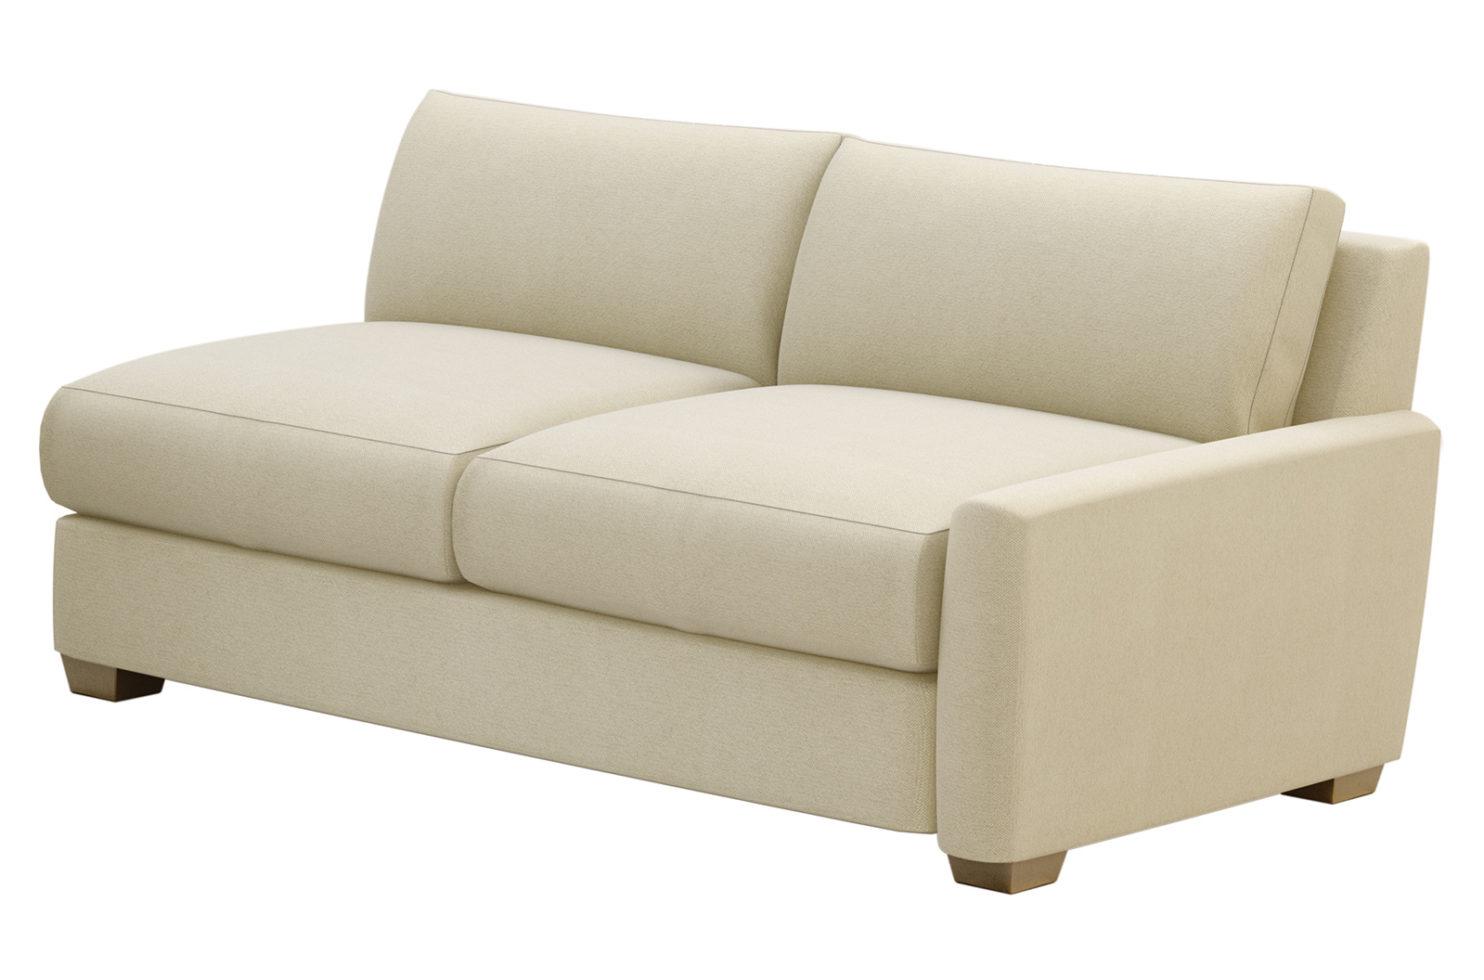 fizz imperial one arm apartment sofa 105FT004P2 SS RAF